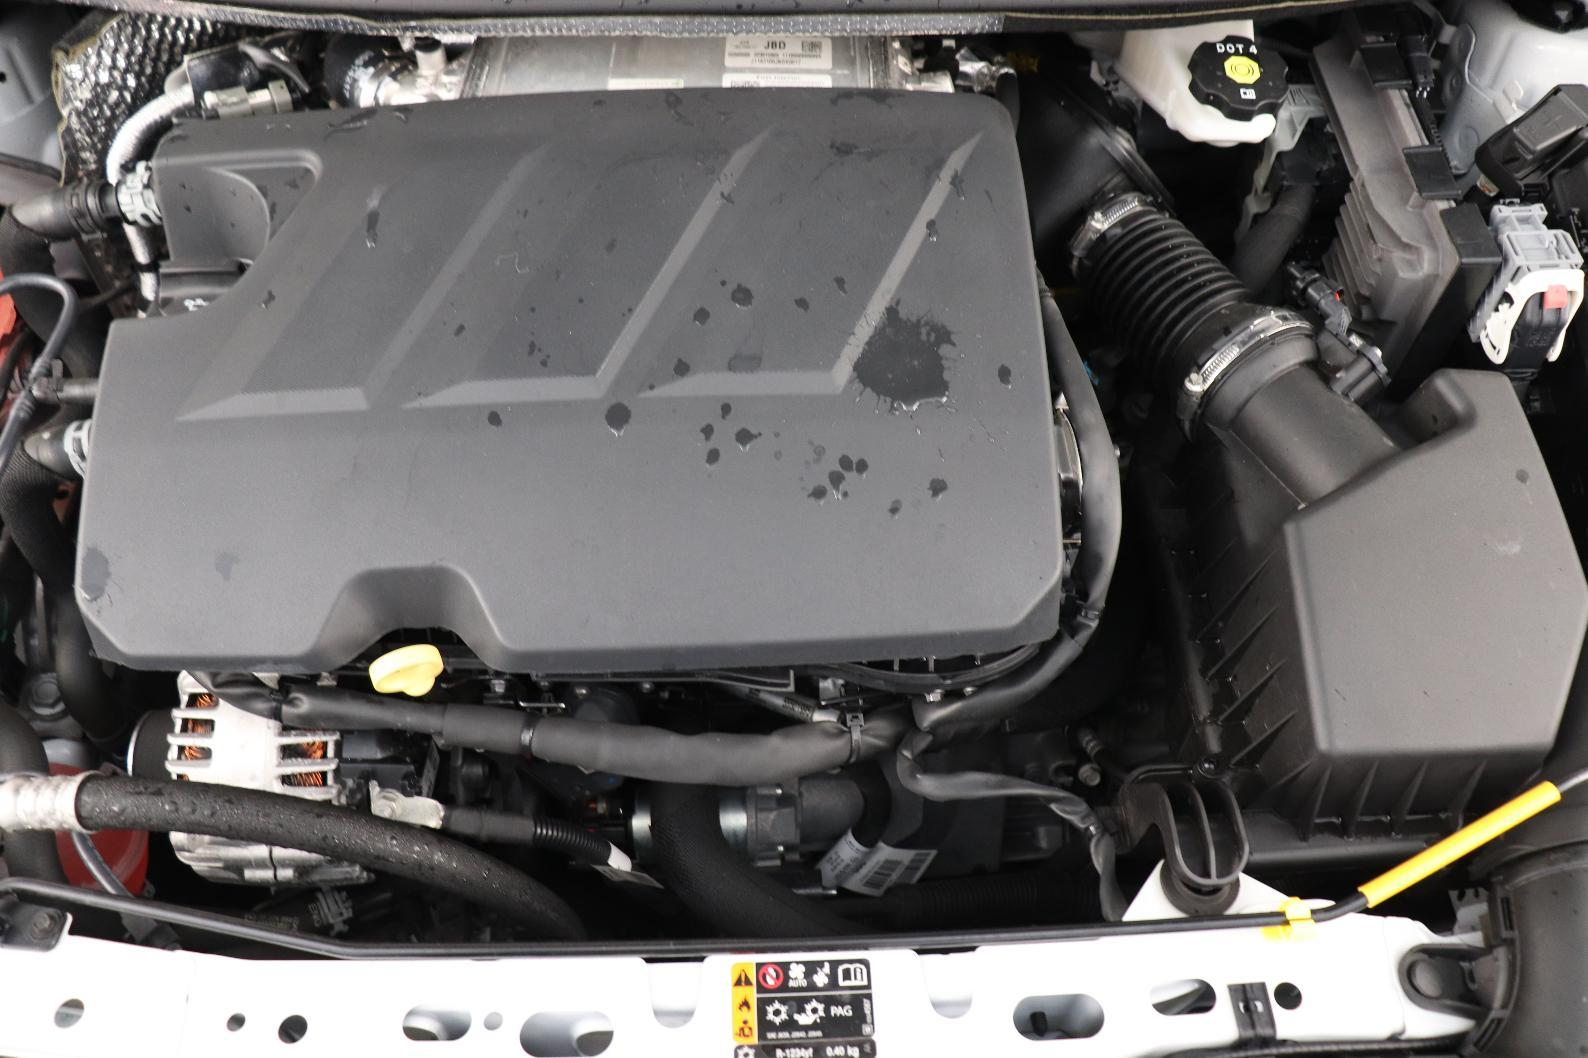 OPEL ASTRA 1.5 Diesel 105 ch BVM6 Elegance